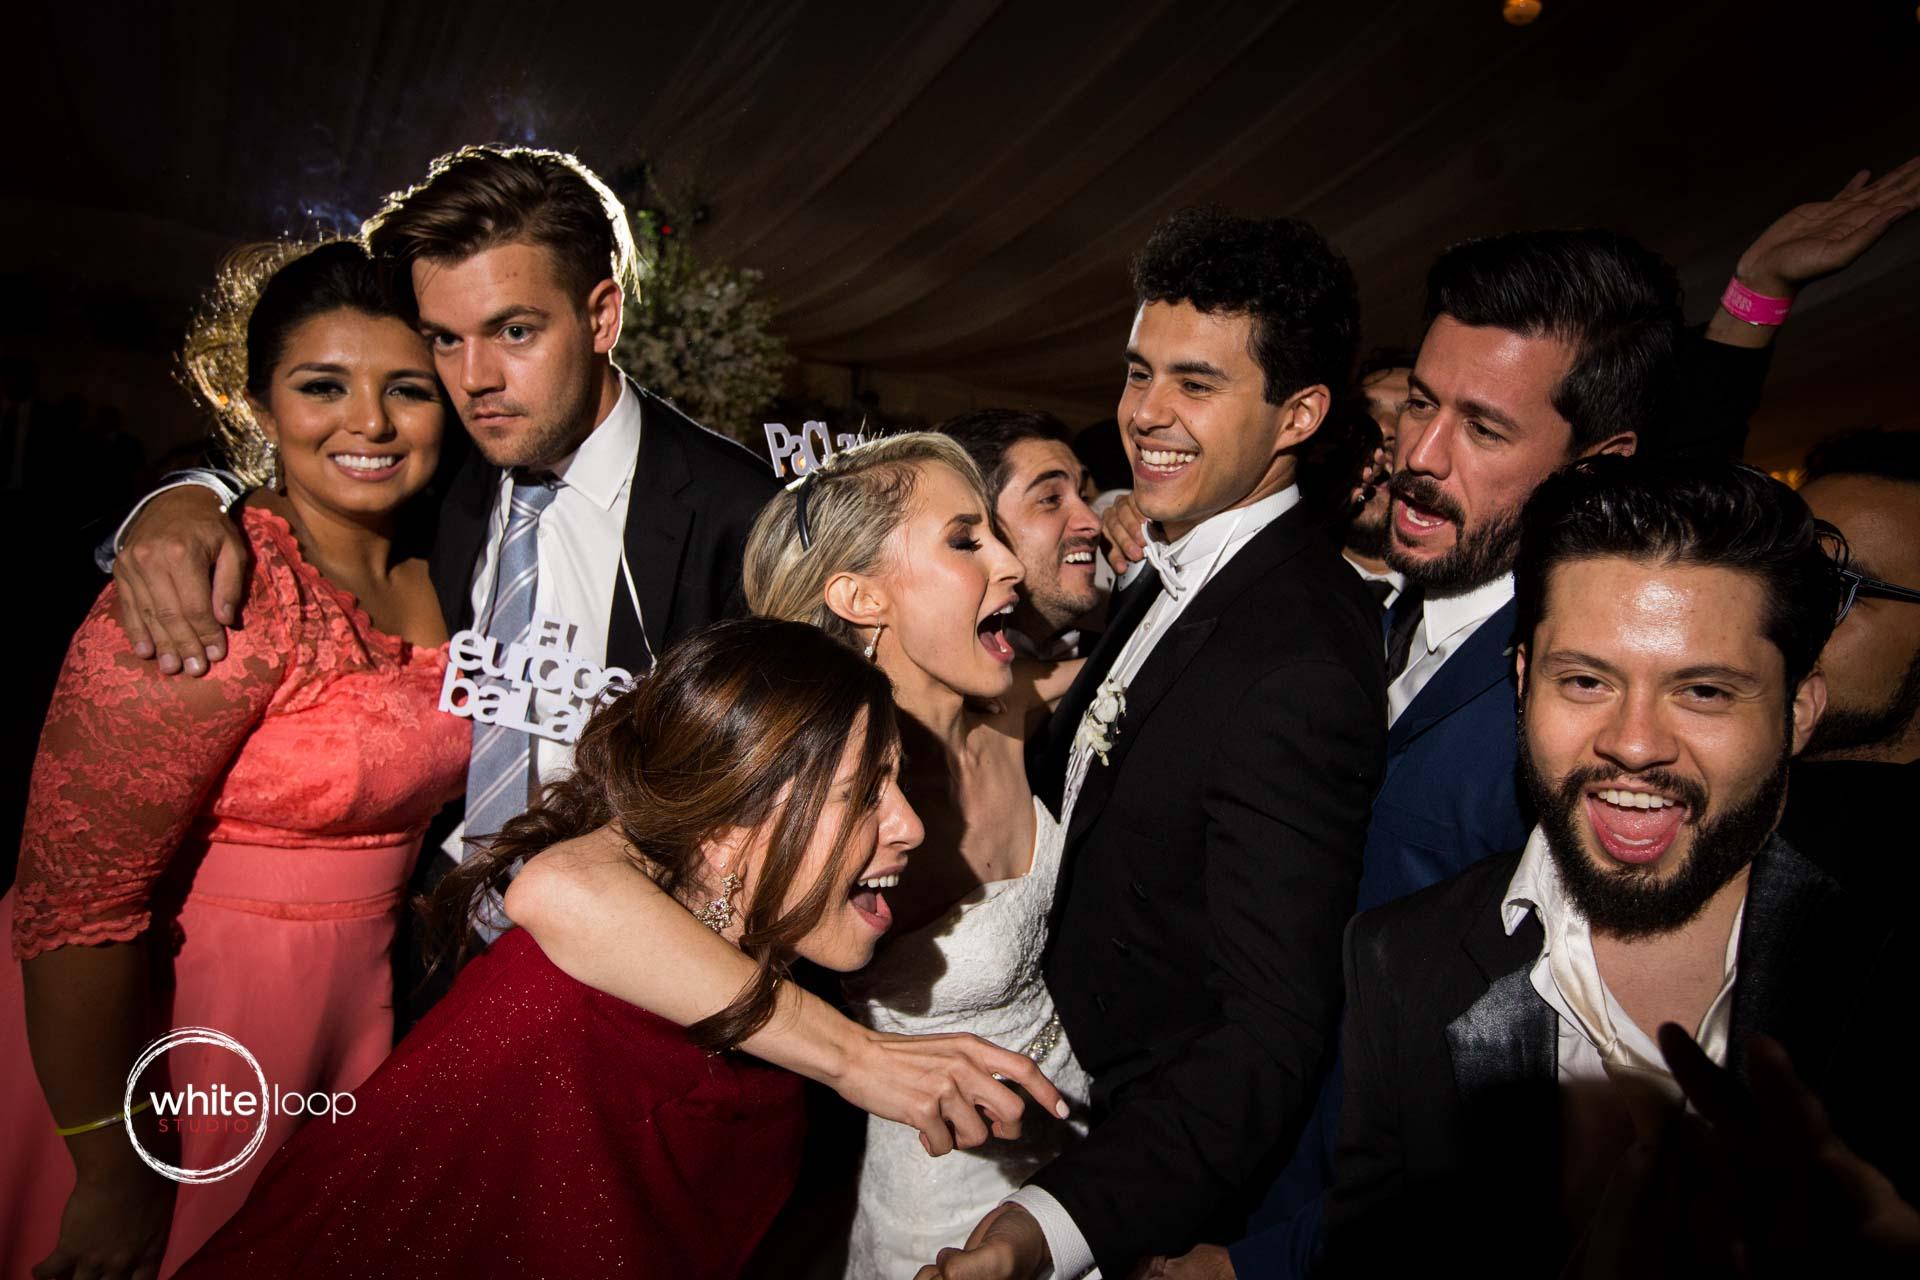 Claudia and Francisco wedding party, Guadalajara, Mexico